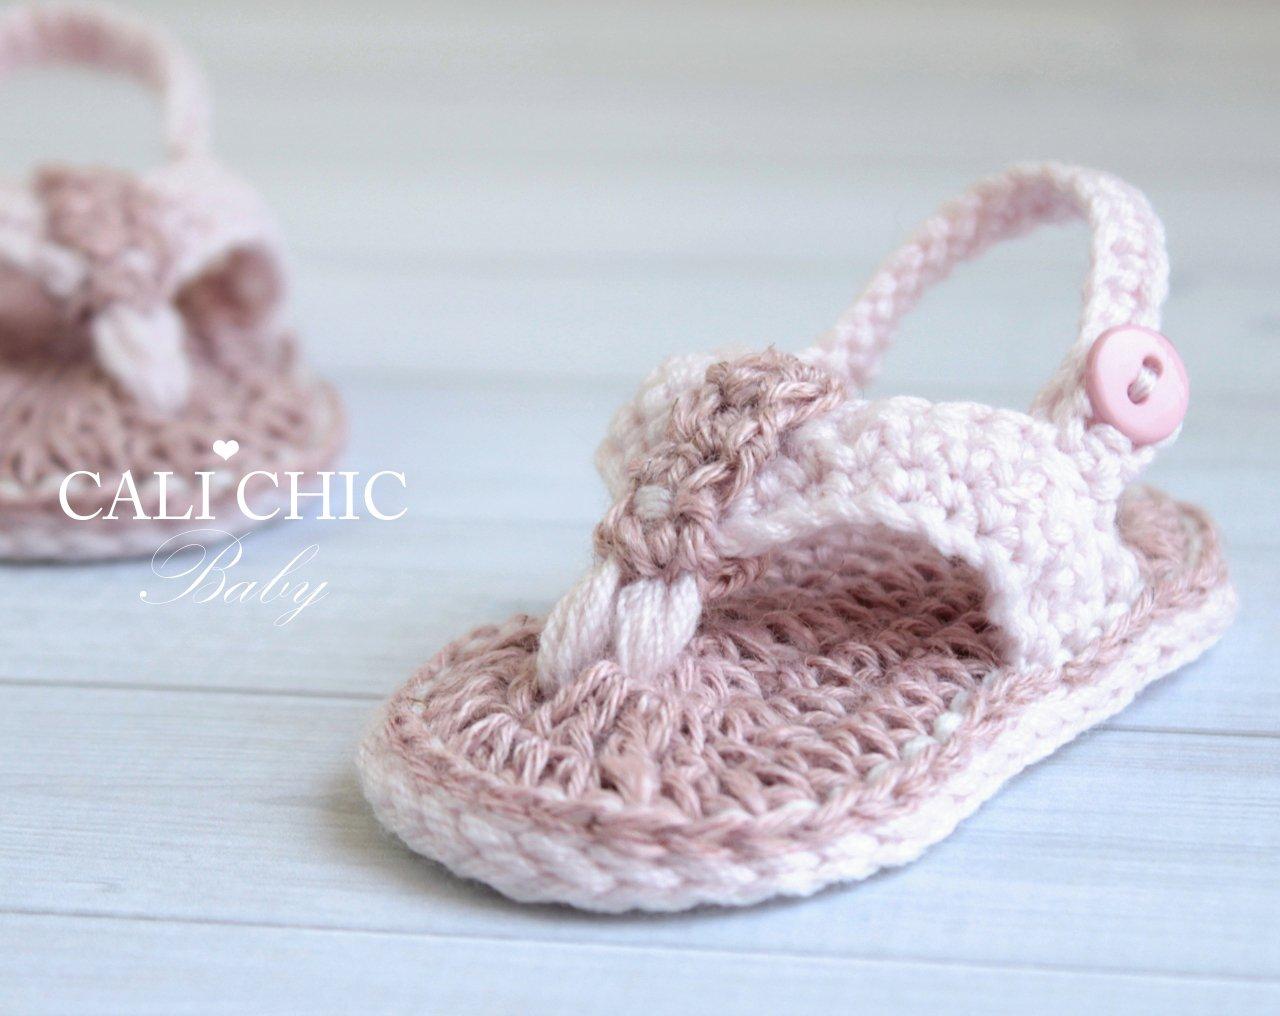 Malibu BabyCrochet Flip FlopBaby ShoesPattern 312 | Cali Chic Baby